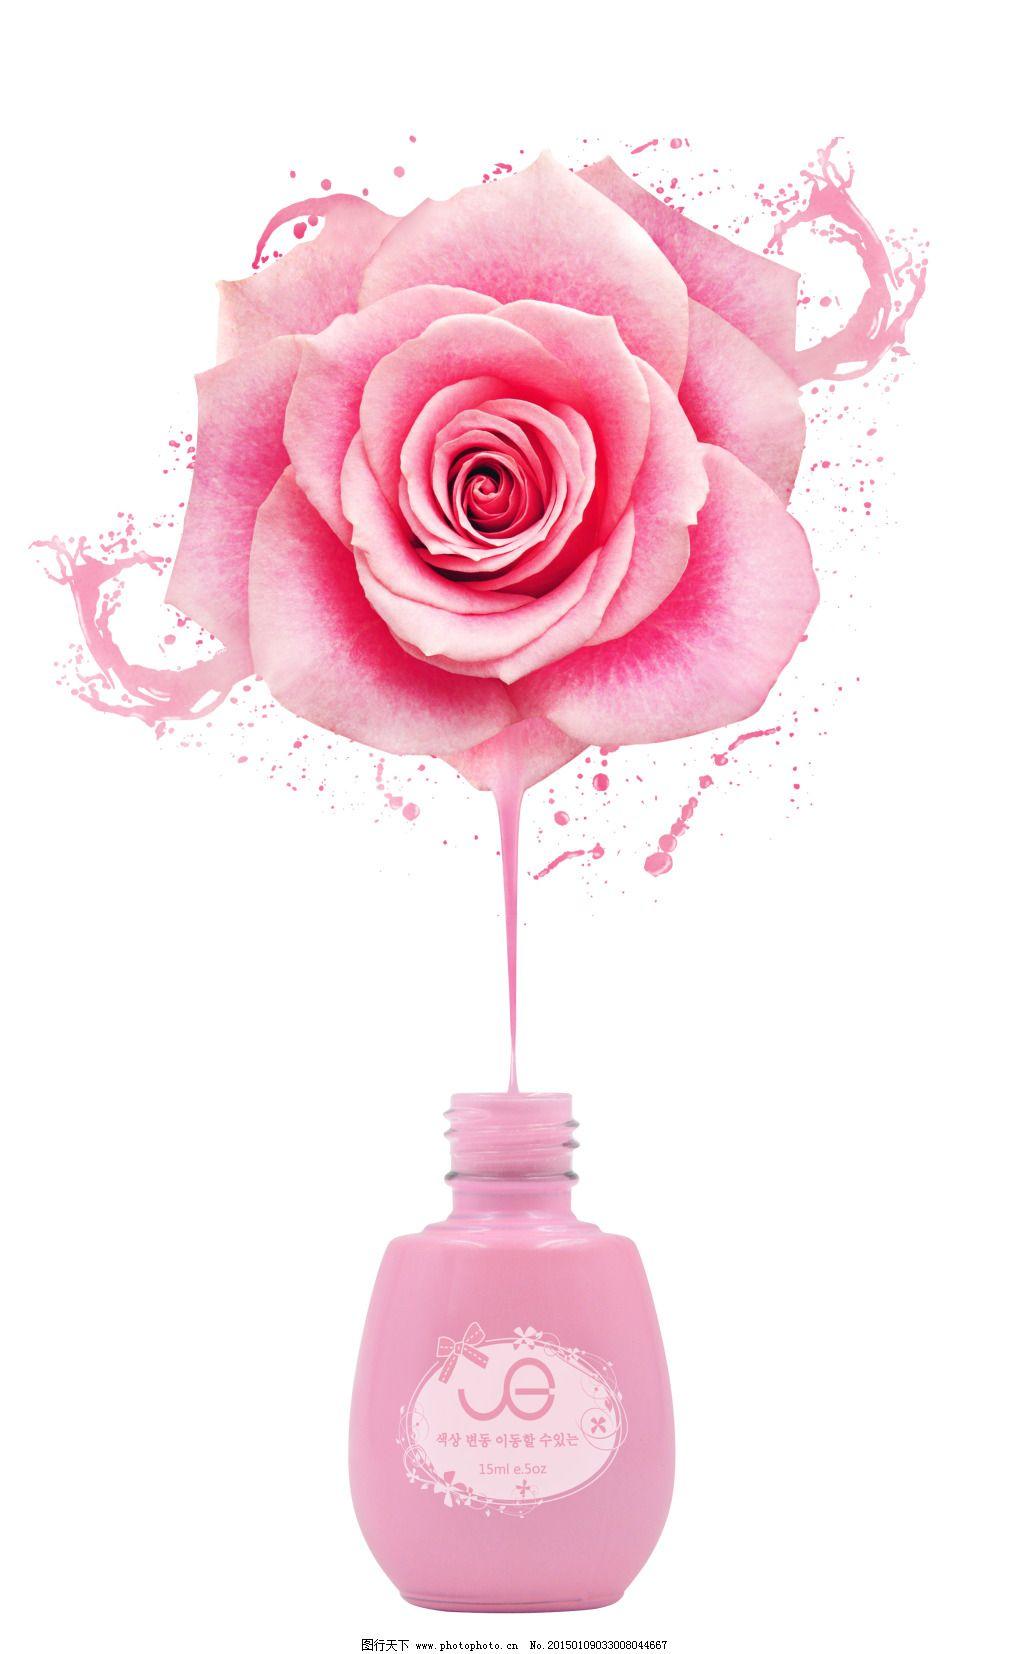 300dpi psd 创意海报 粉色玫瑰 广告设计 花朵 玫瑰花 美甲 油漆 源